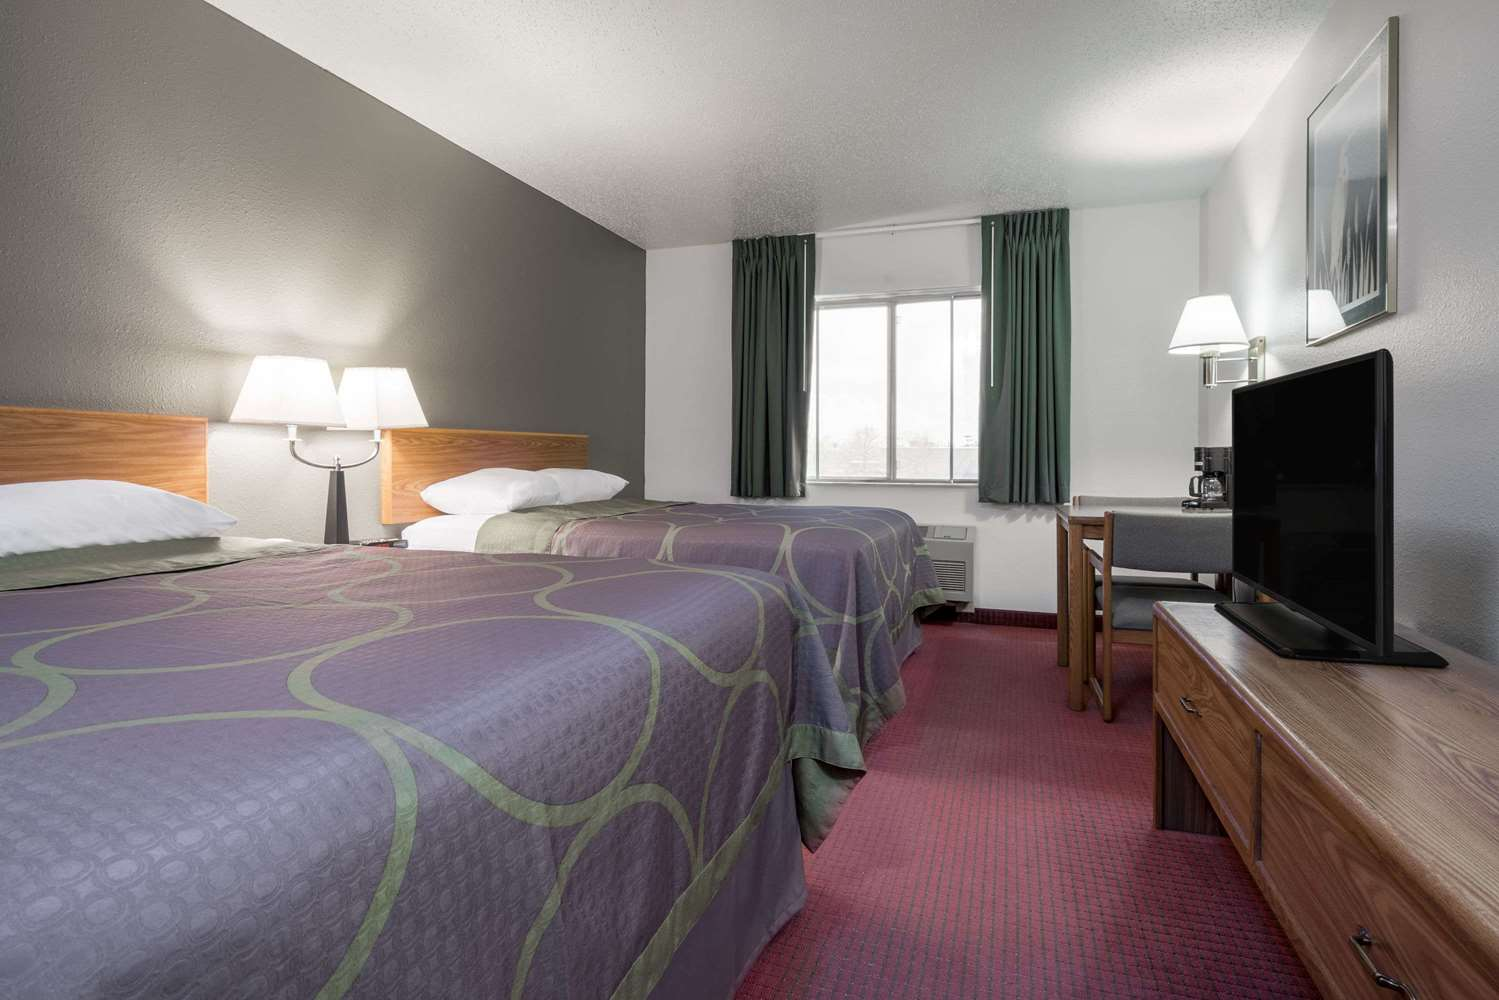 Room - Super 8 Hotel Fond du Lac